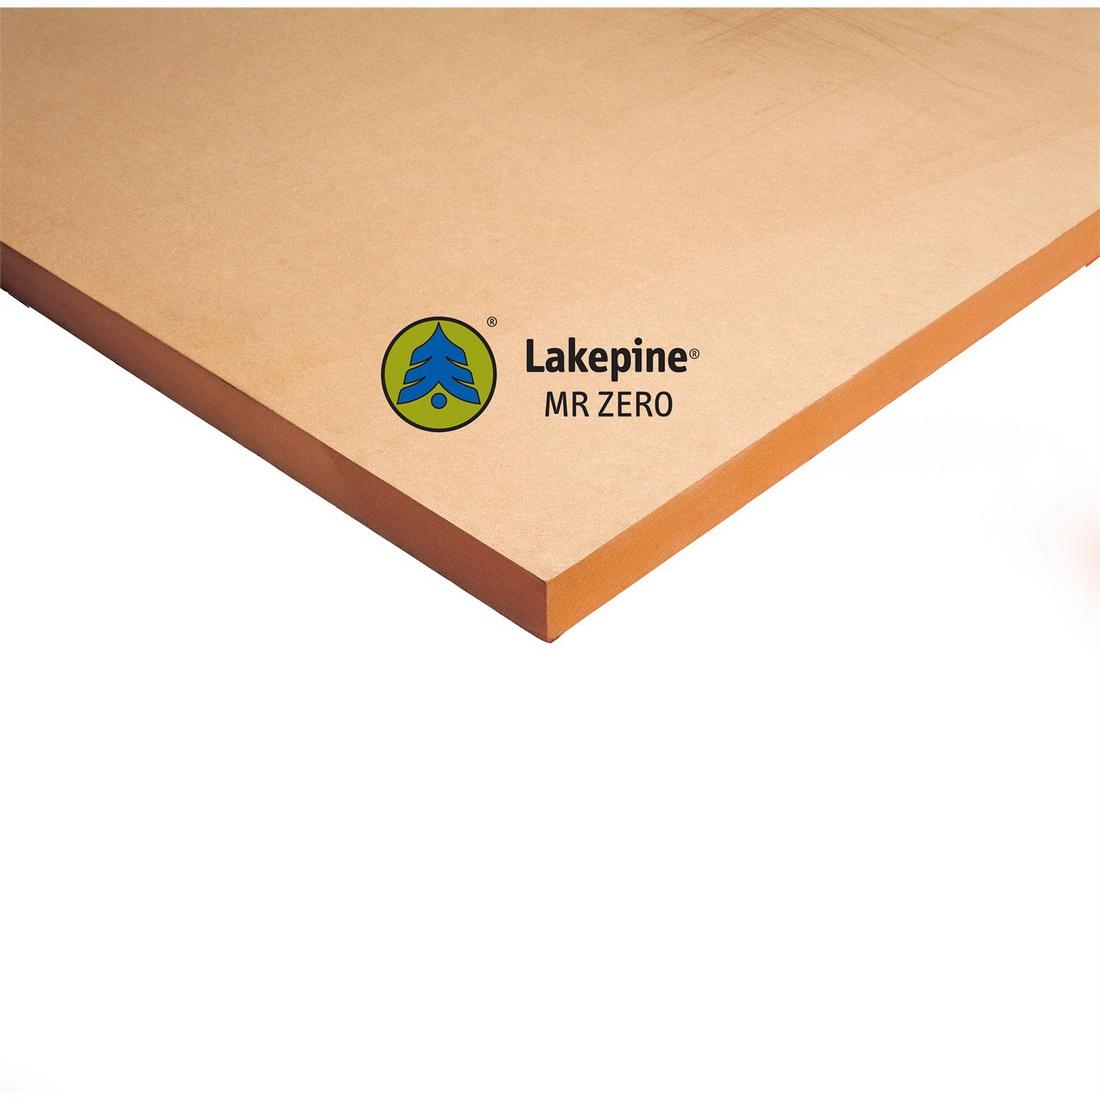 Lakepine Thin MDF Standard Panel 2440 x 1220 x 6mm 8601221